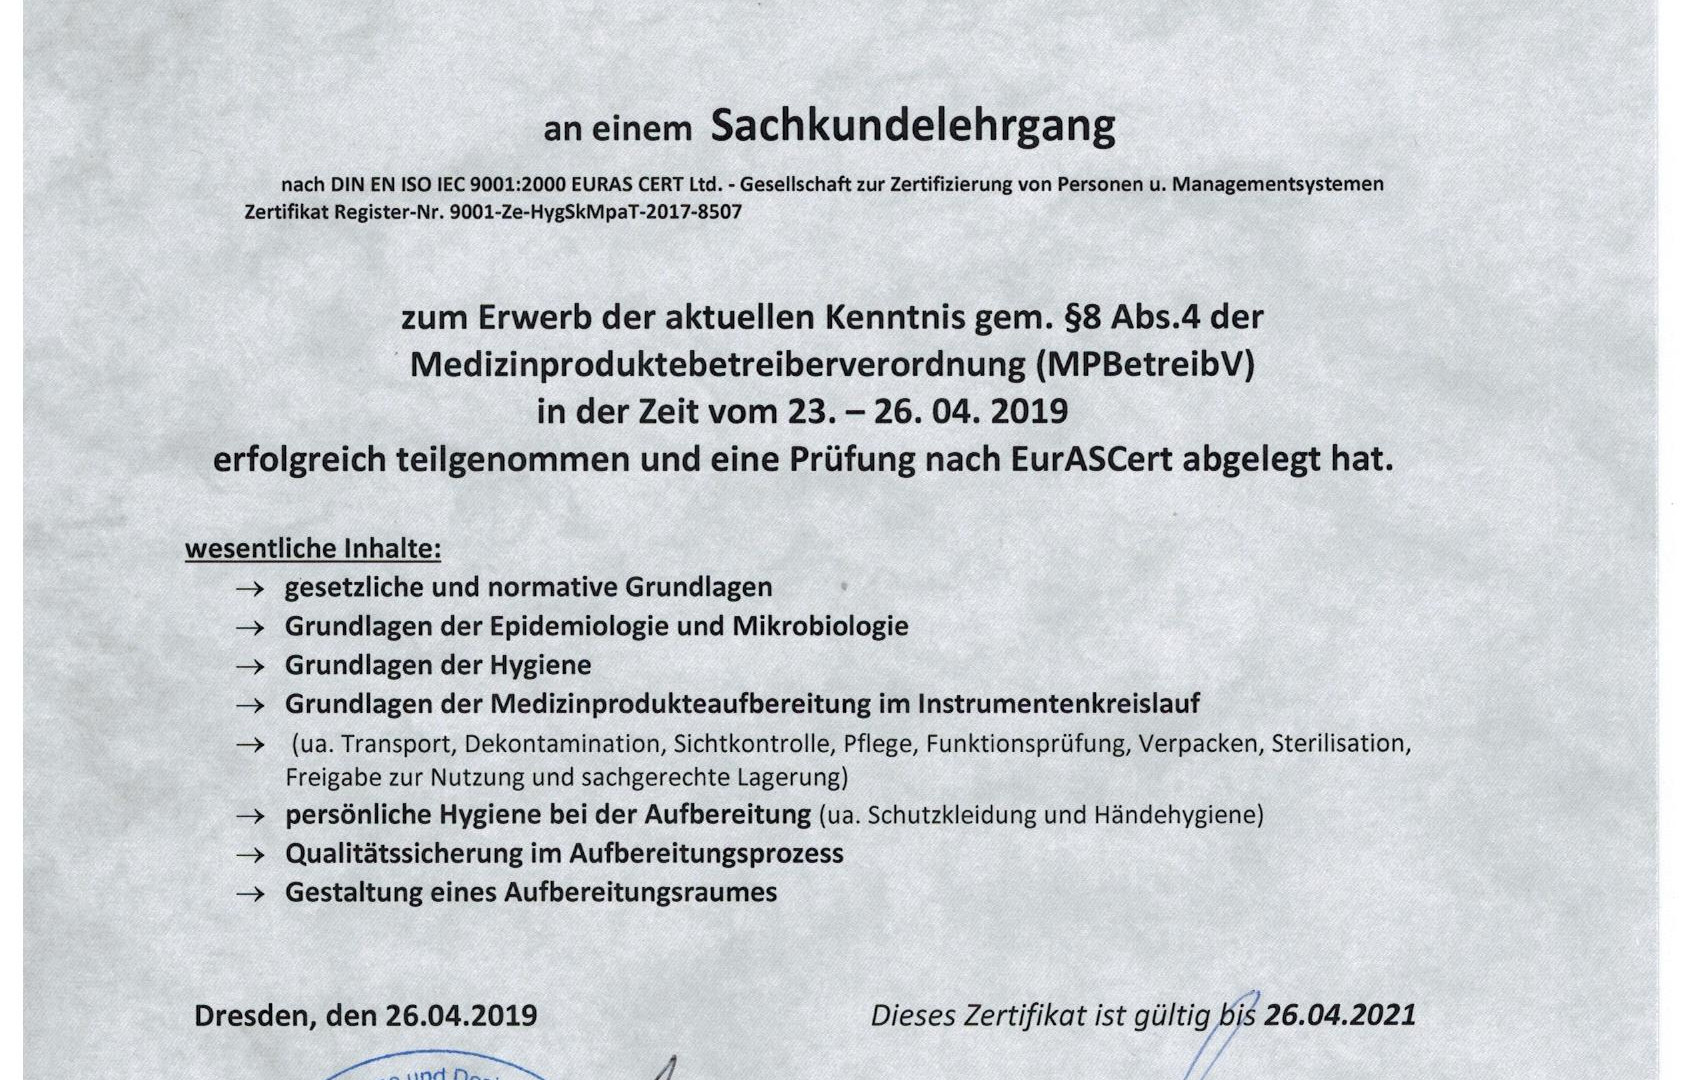 Zertifikat_Sachkundenachweis